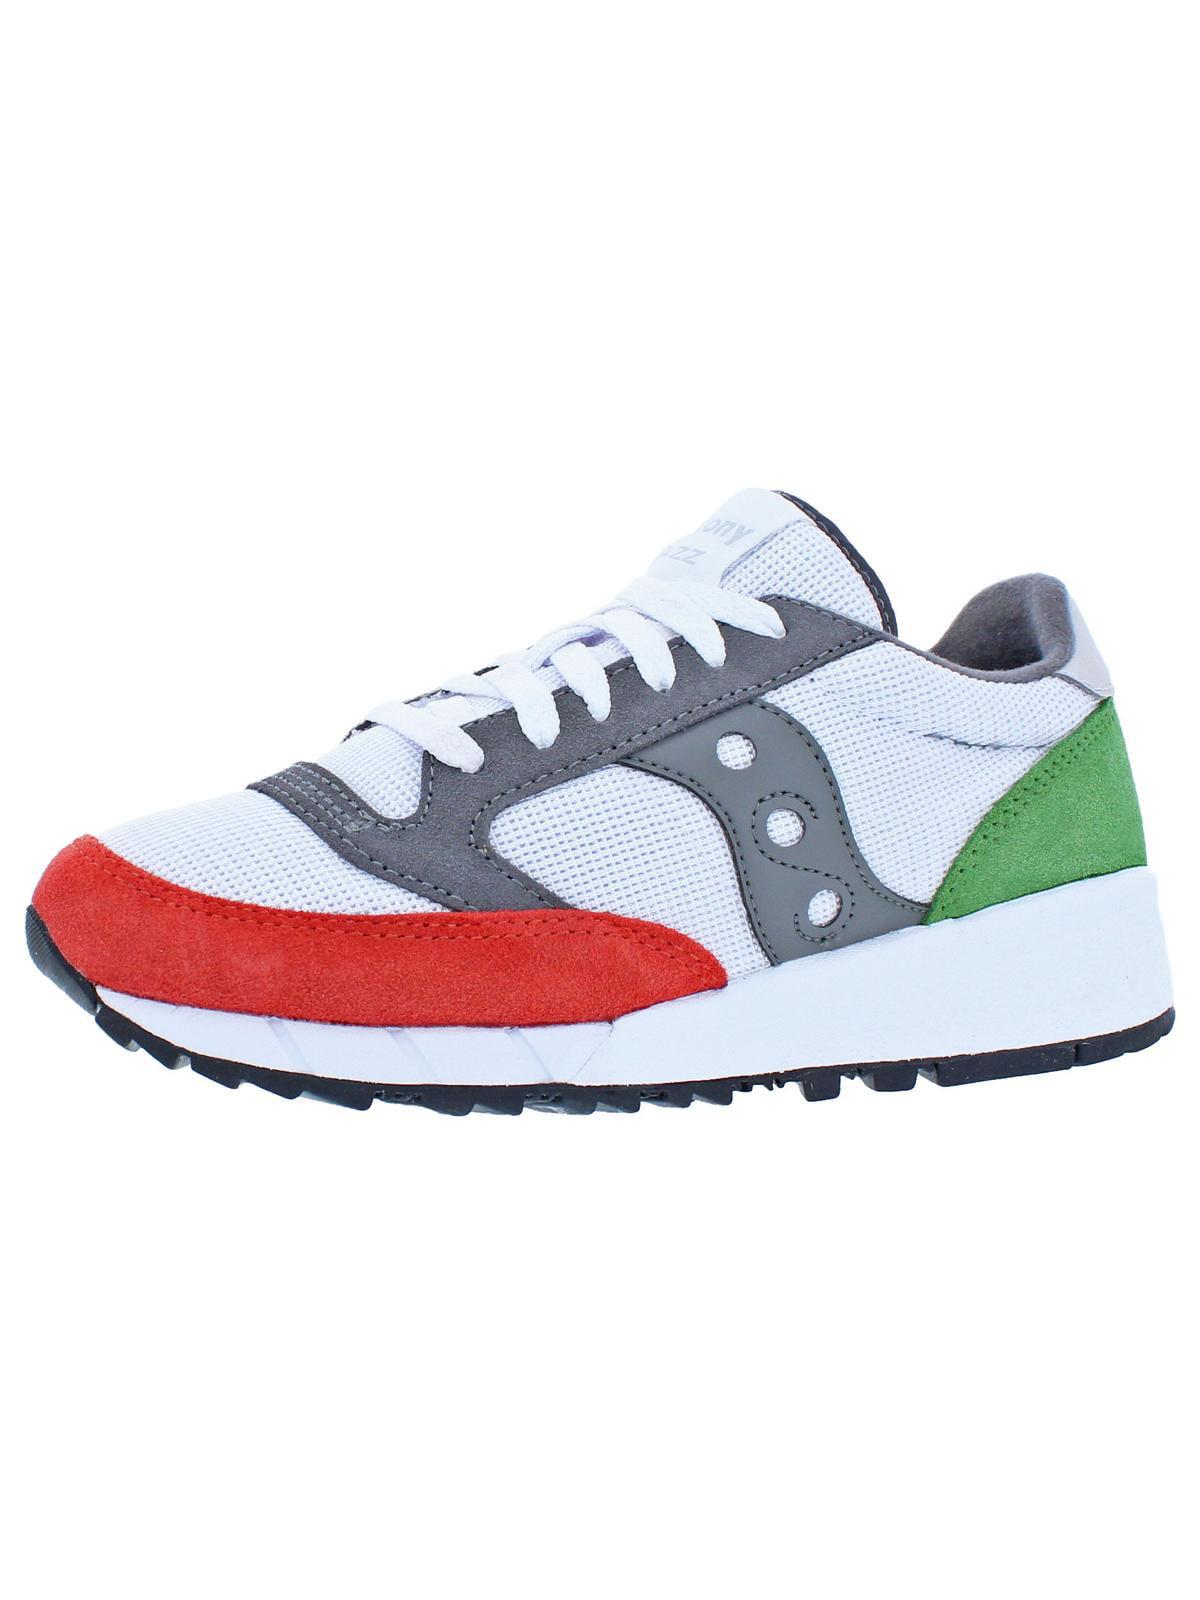 Saucony Mens Jazz '91 Retro Fashion Sneakers White 6 Medium (D)